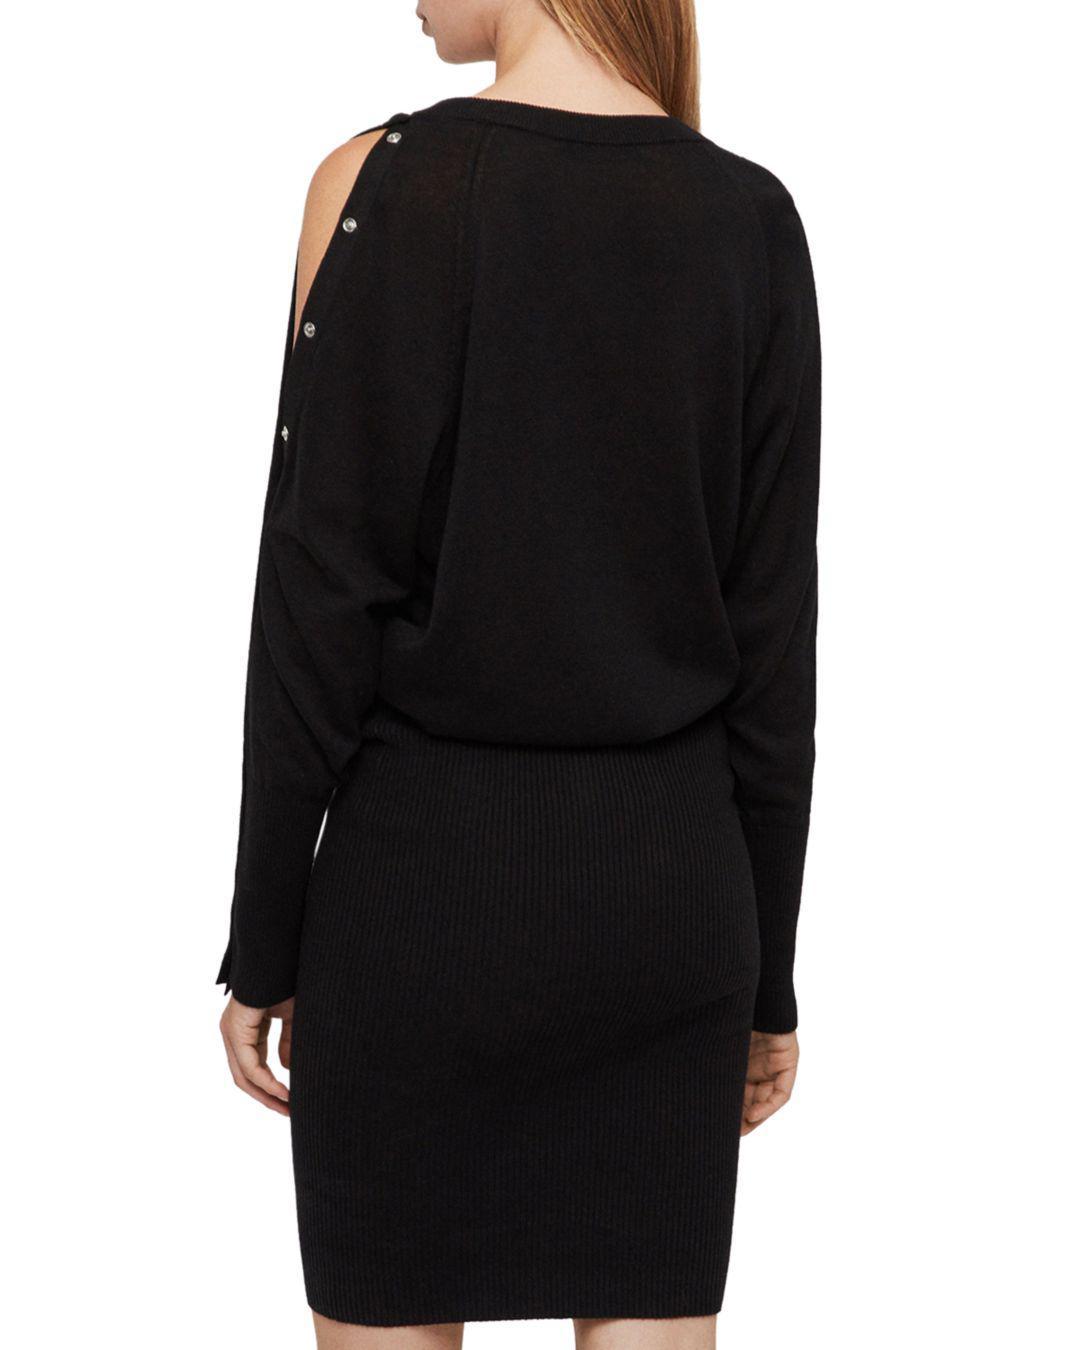 7f396f1ac3c AllSaints Suzie Snap-sleeve Sweater Dress in Black - Lyst